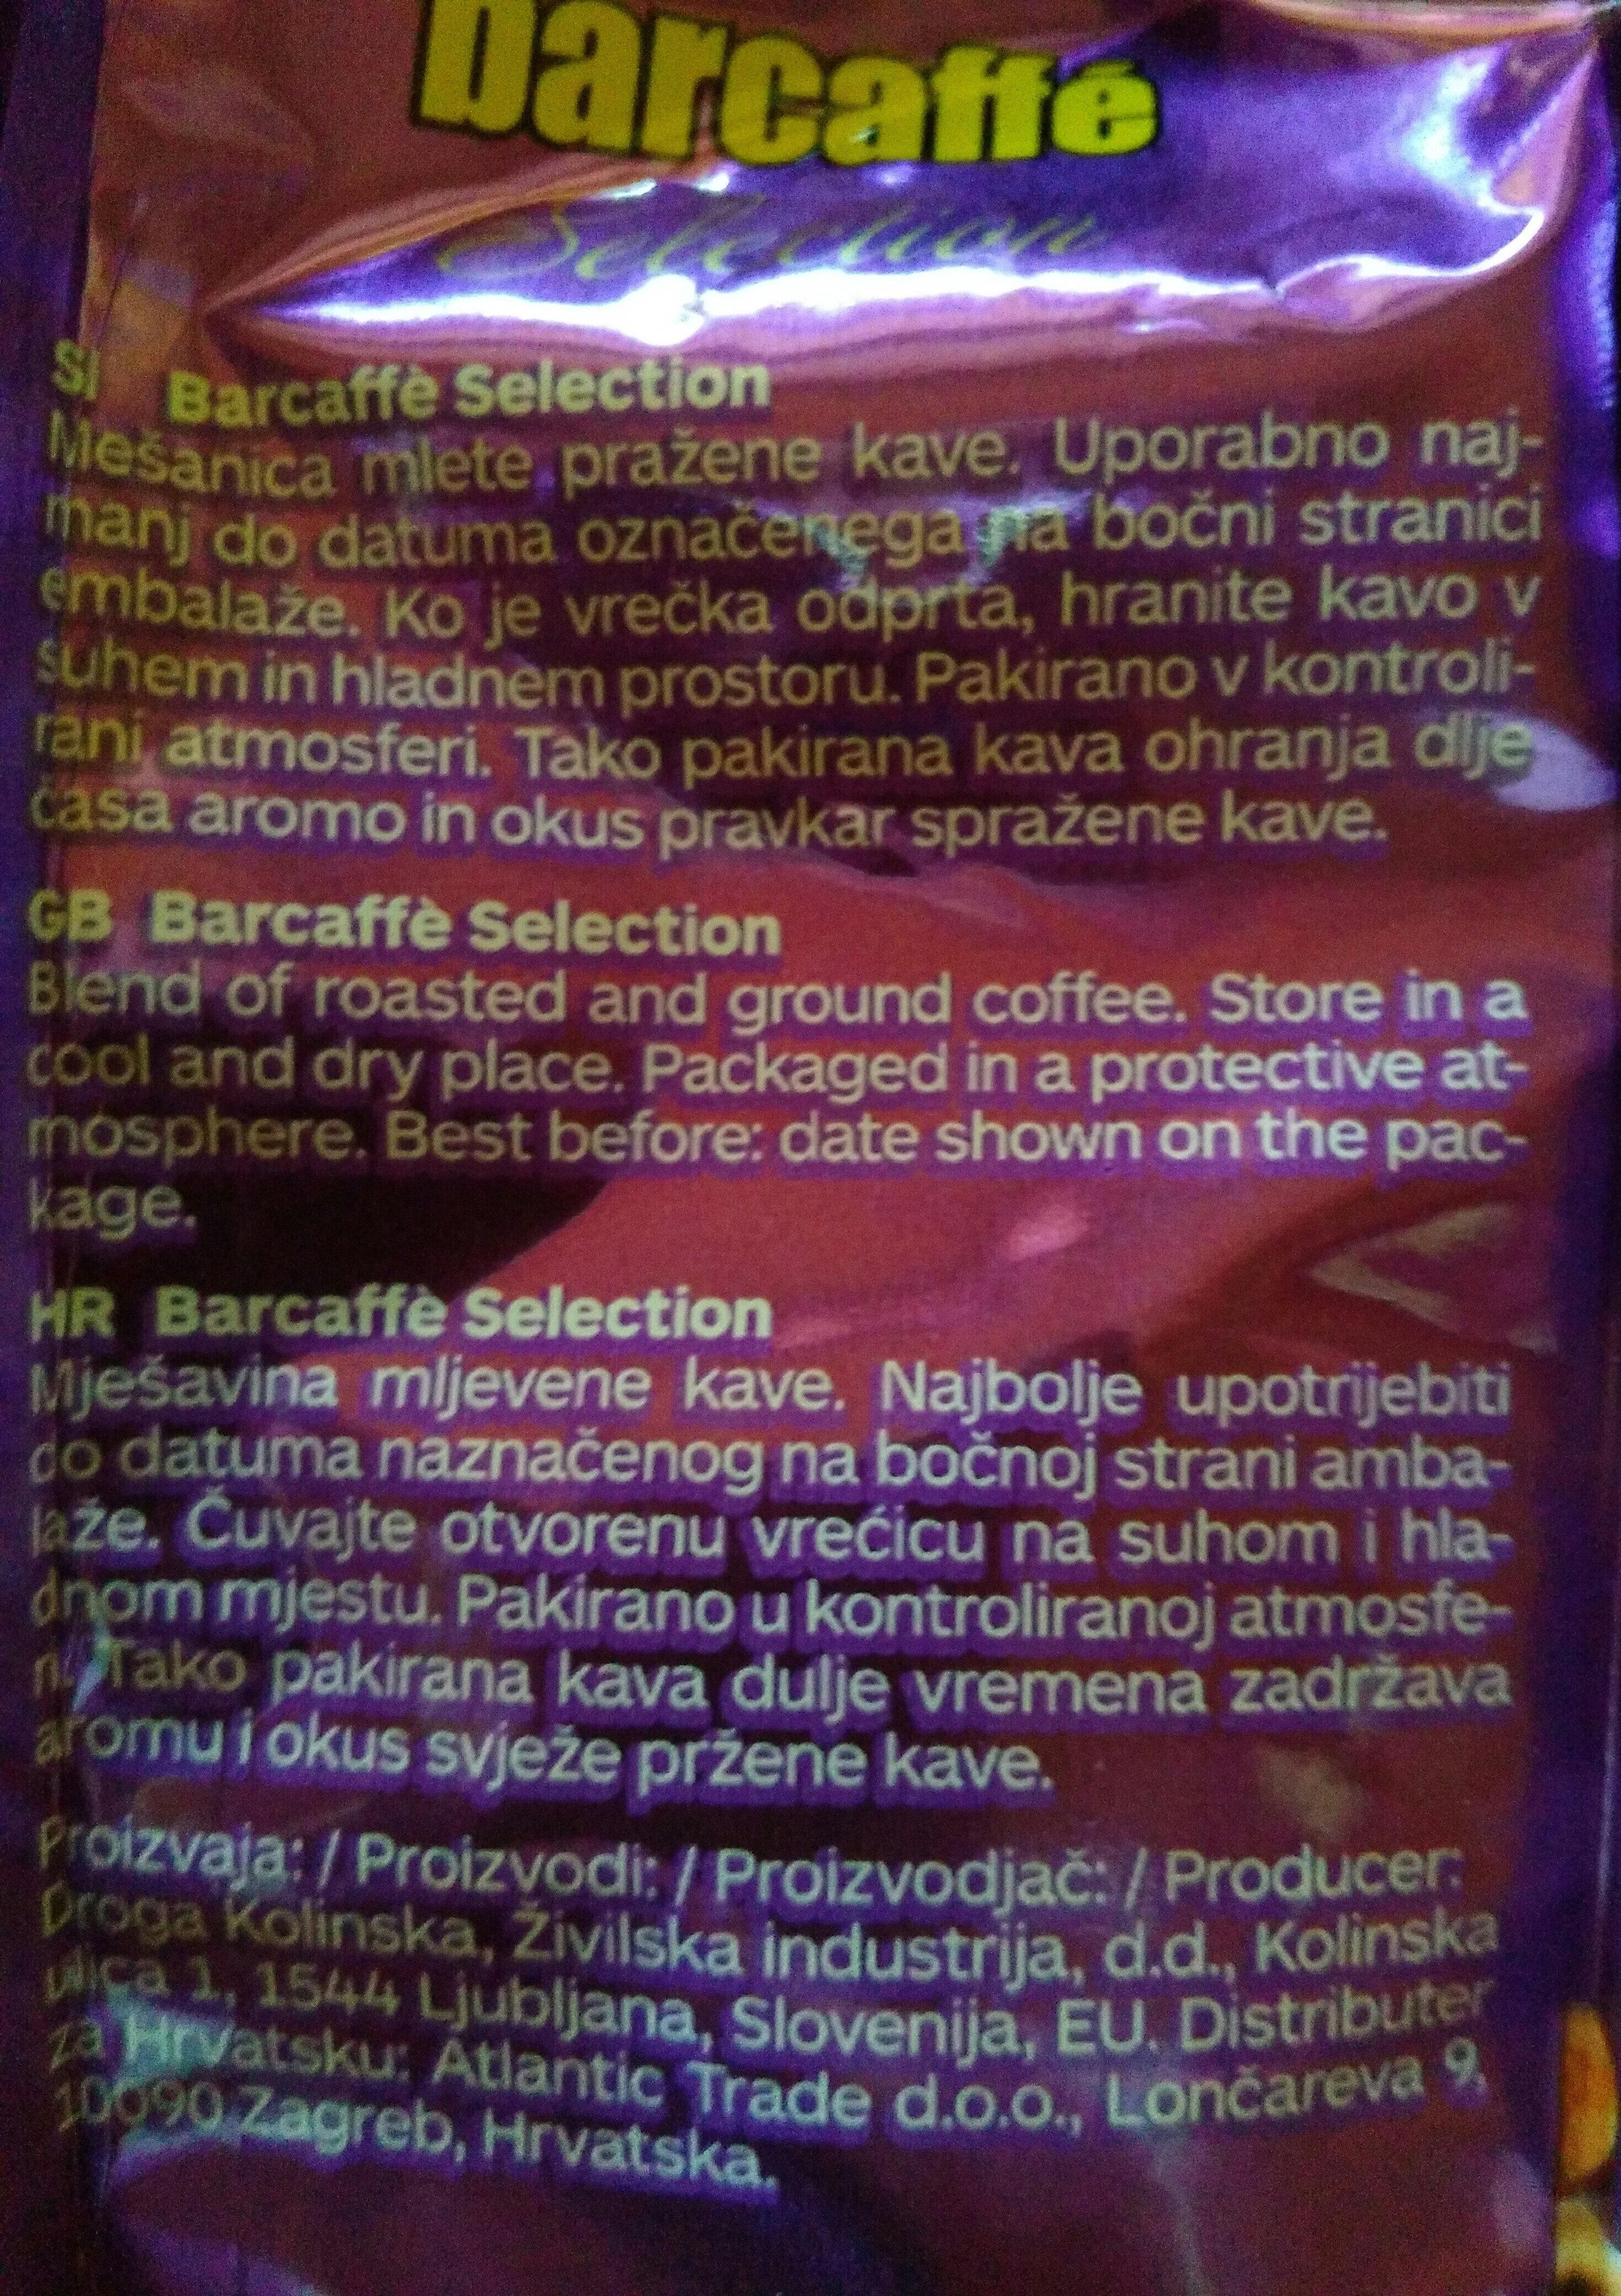 barcaffé Selection - Ingredients - sl